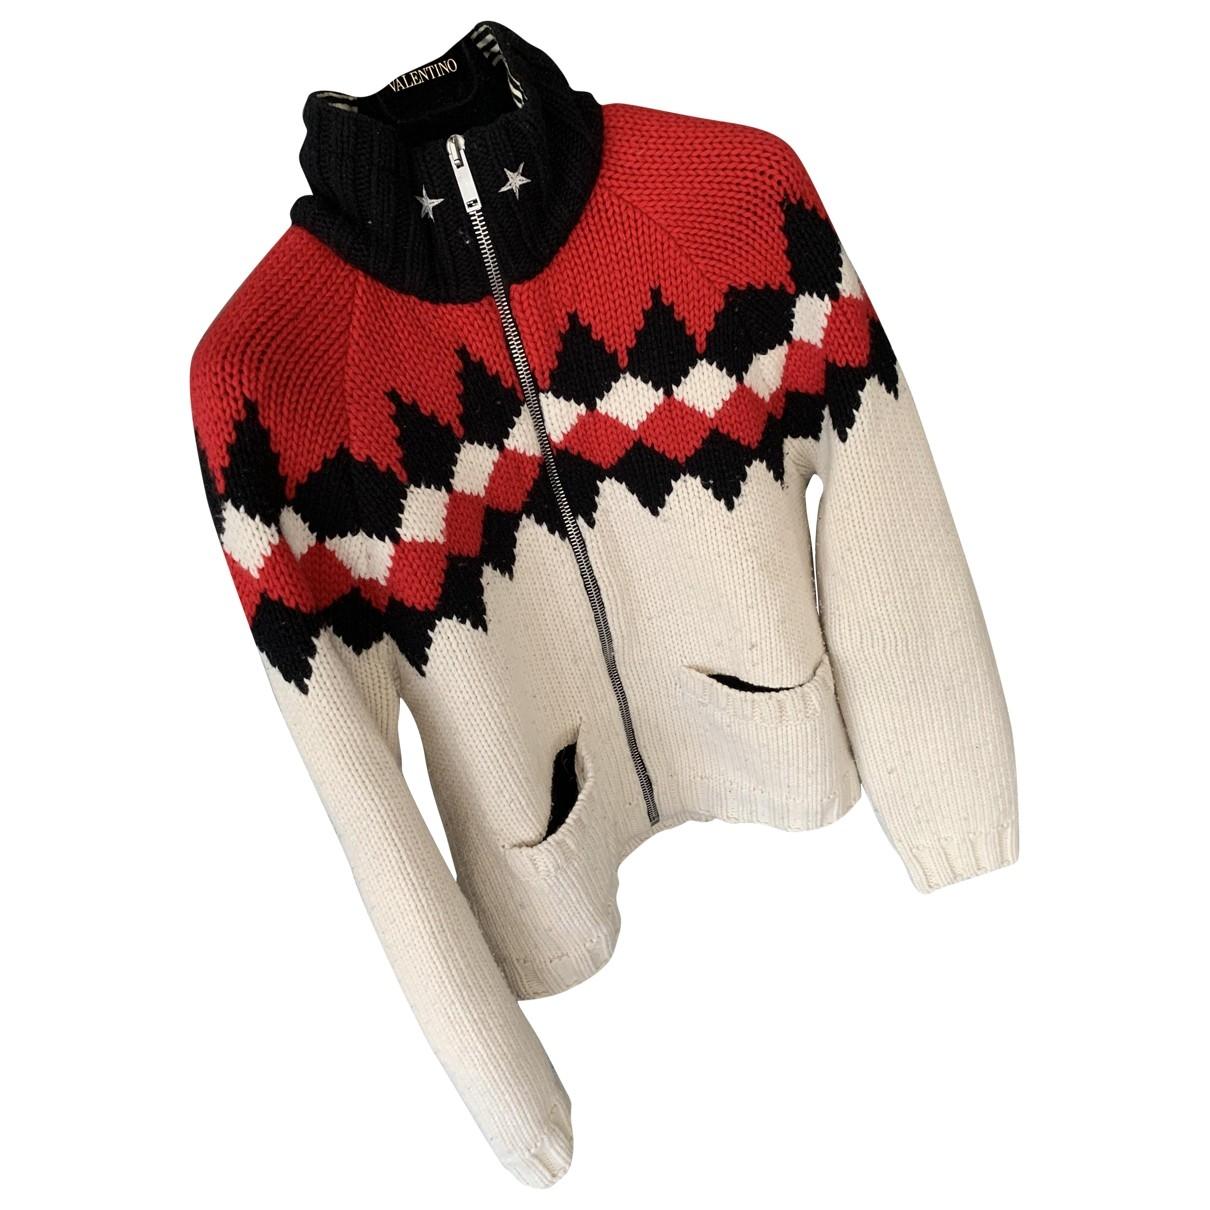 Valentino Garavani \N Multicolour Cotton Knitwear & Sweatshirts for Men M International